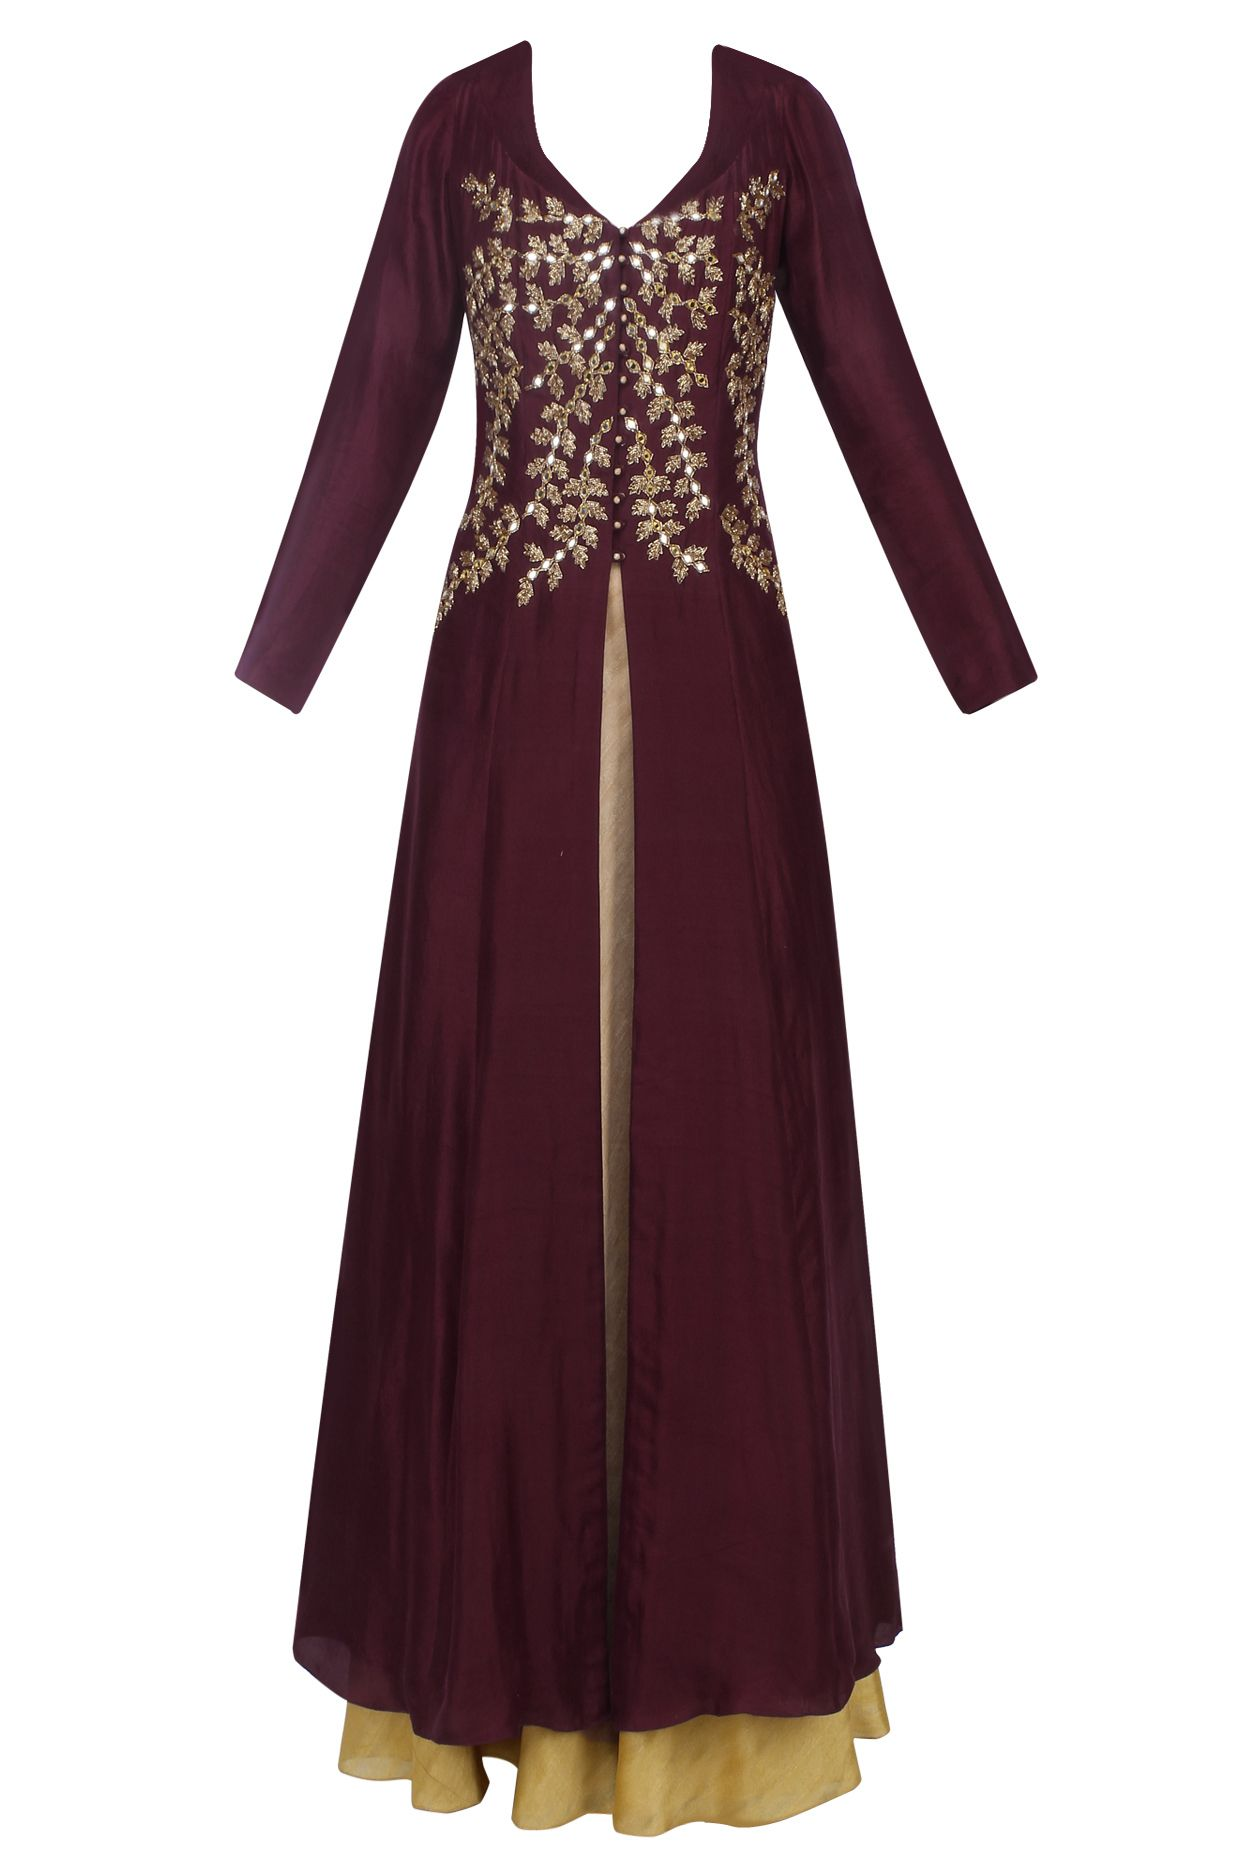 Dark plum mirror and cutdana work long jacket and gold skirt set